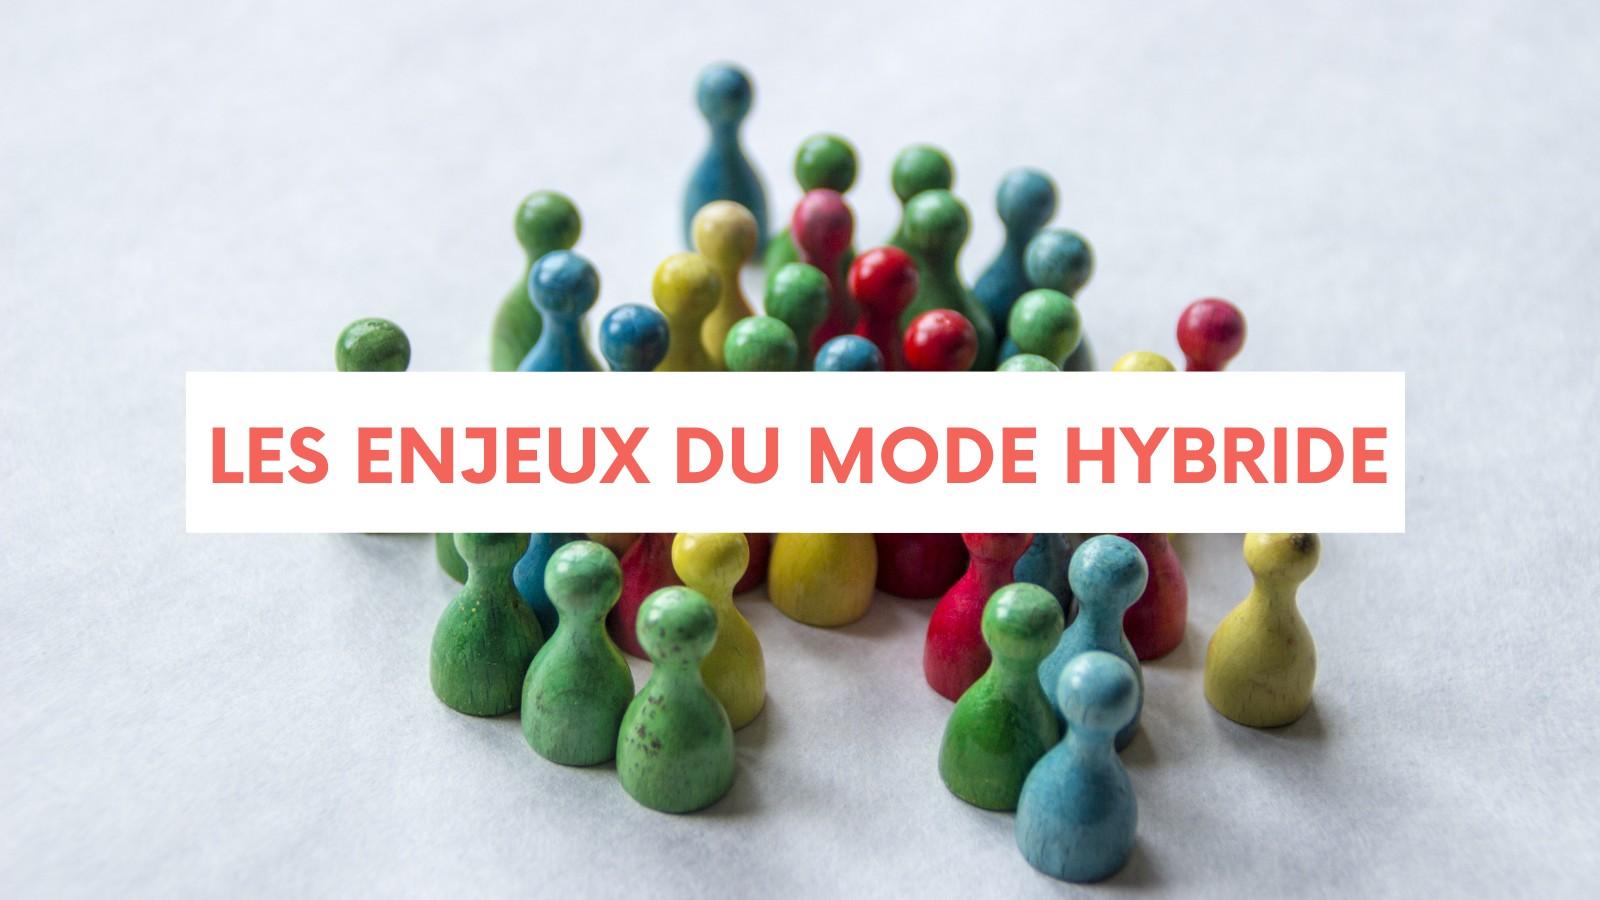 Les grands enjeux du mode hybride